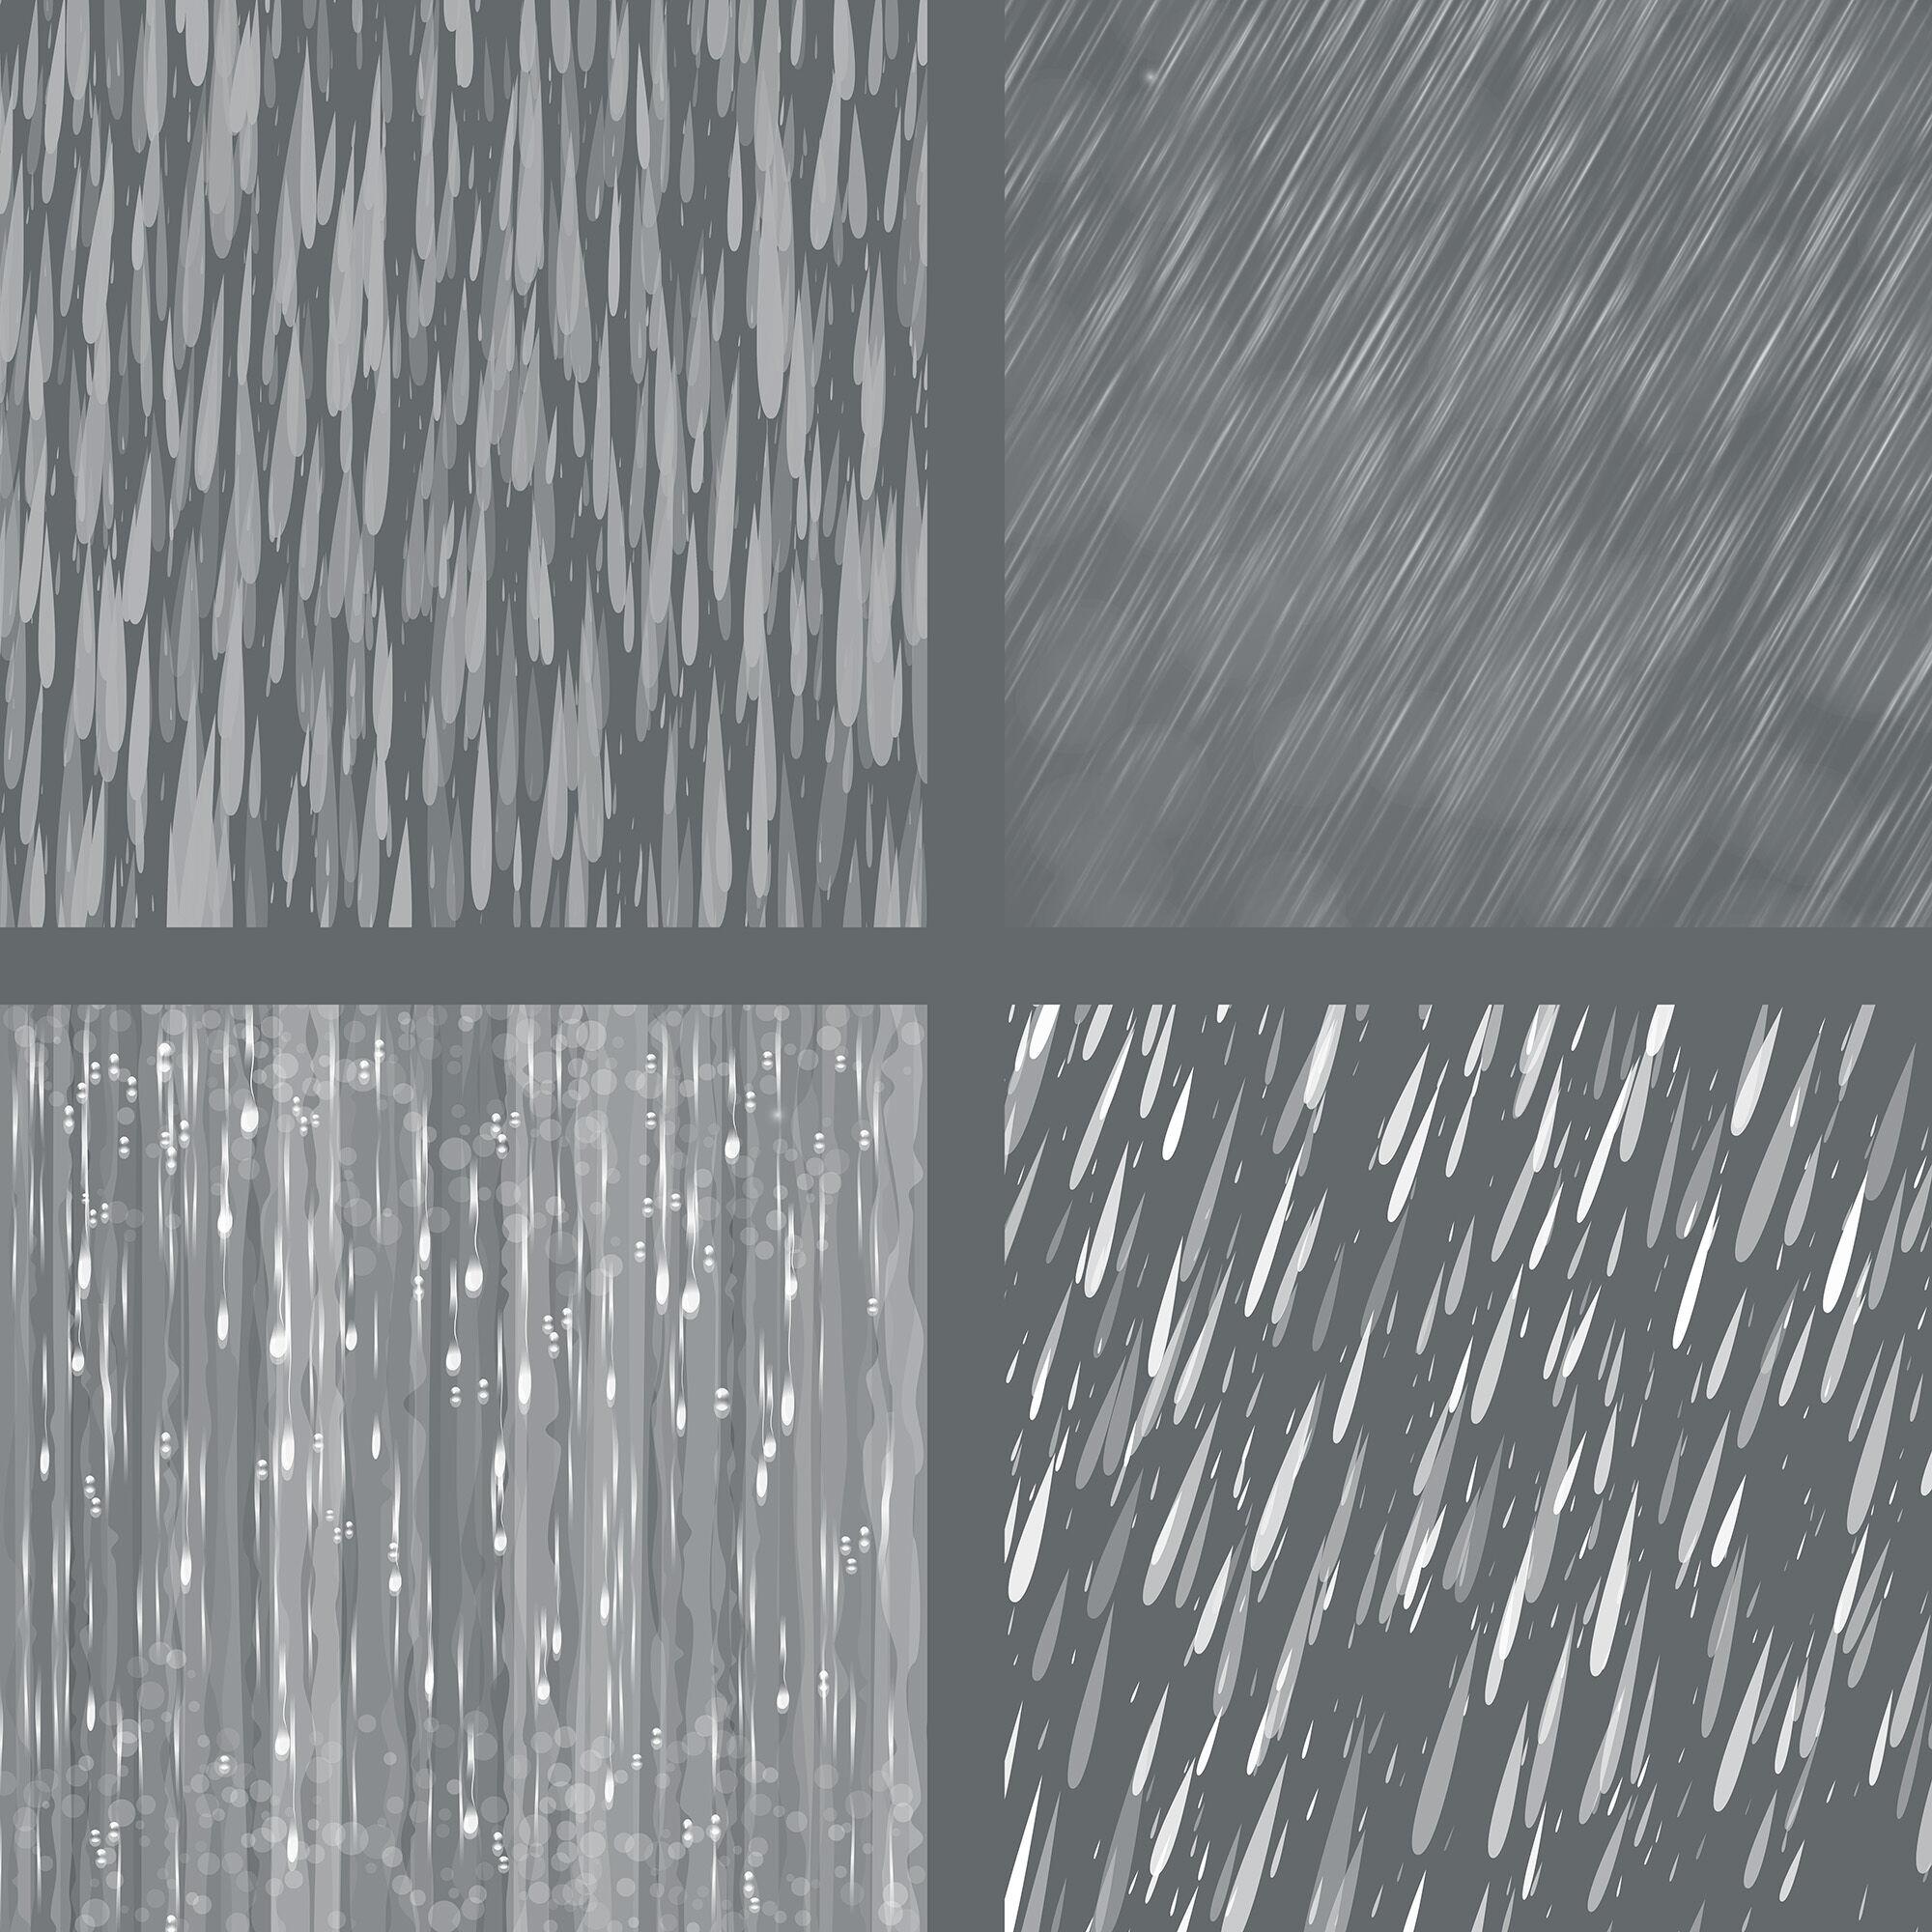 Rain Overlays Clipart, Falling Rain, Photoshop Overlays, By.